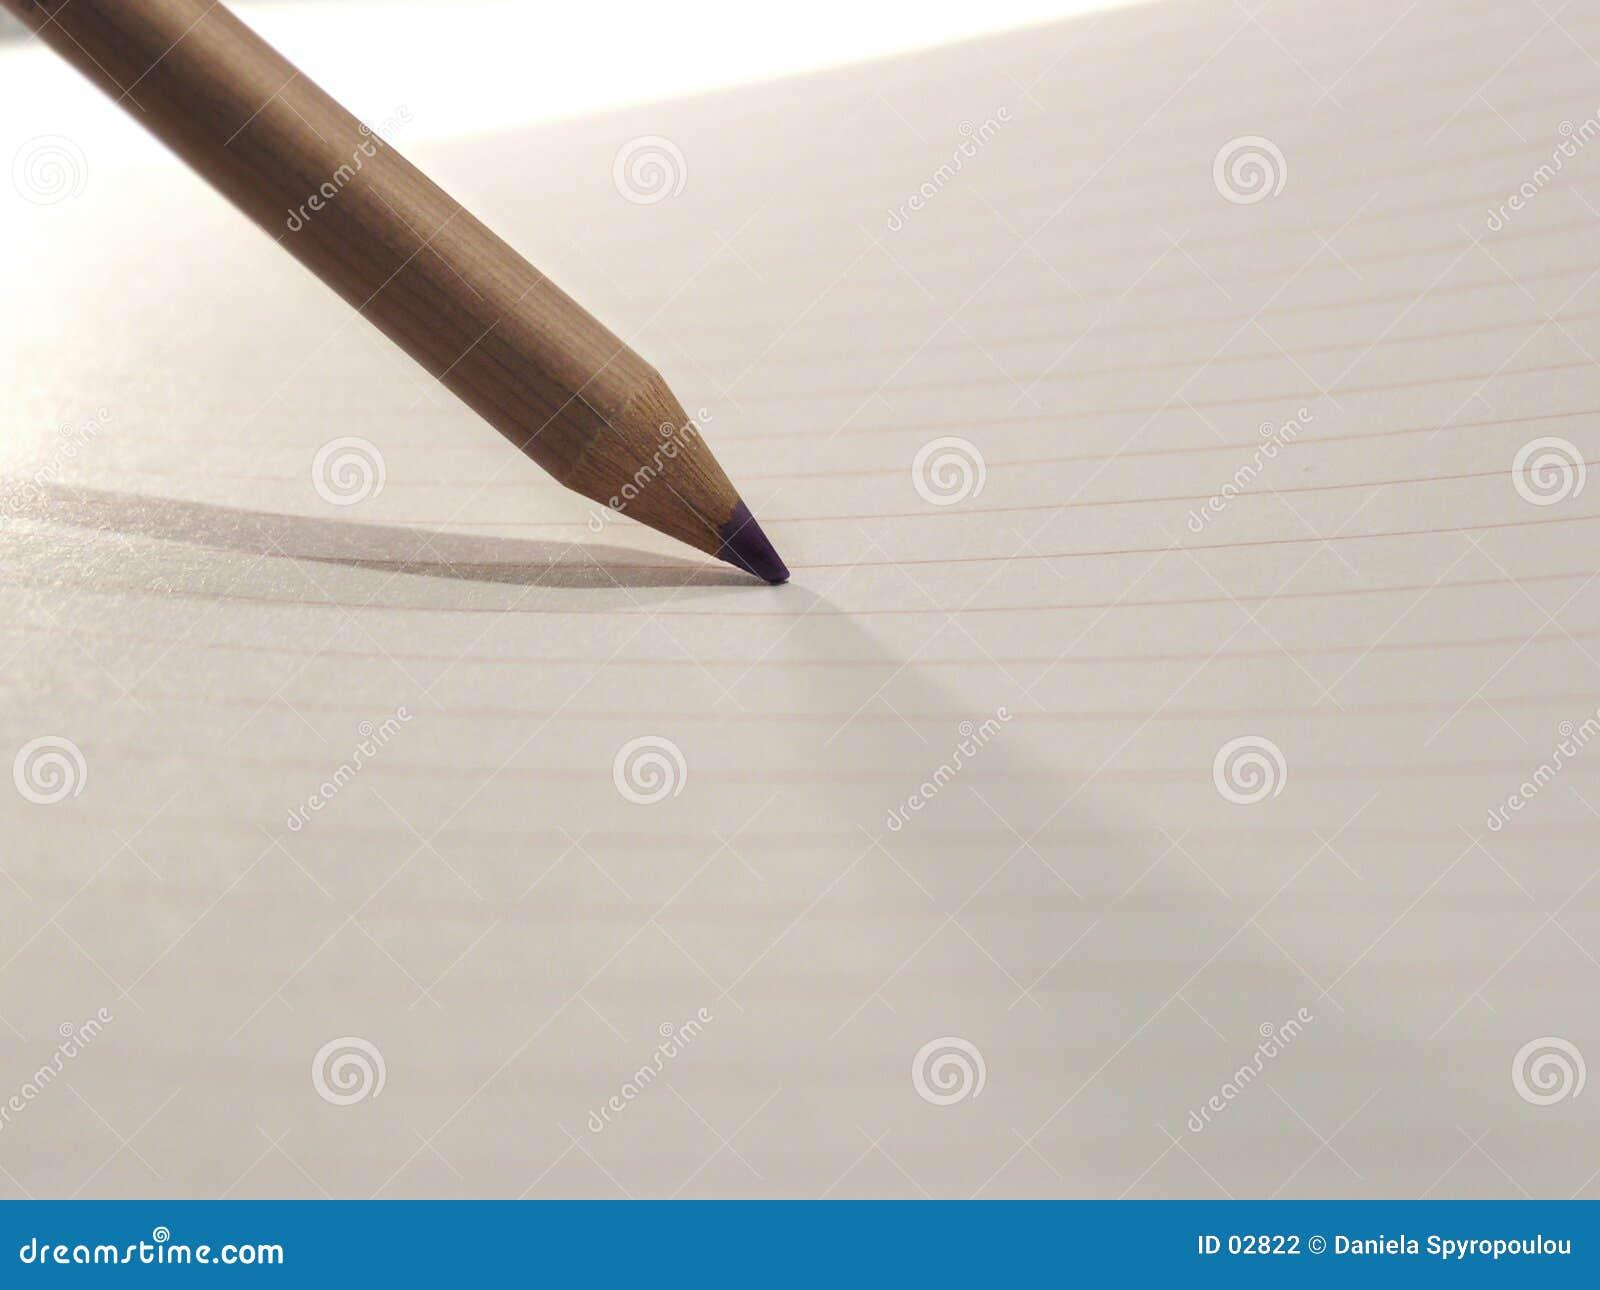 Download 纸铅笔 库存例证. 插画 包括有 木炭, 写道, 木头, 子项, 沟通 - 2822